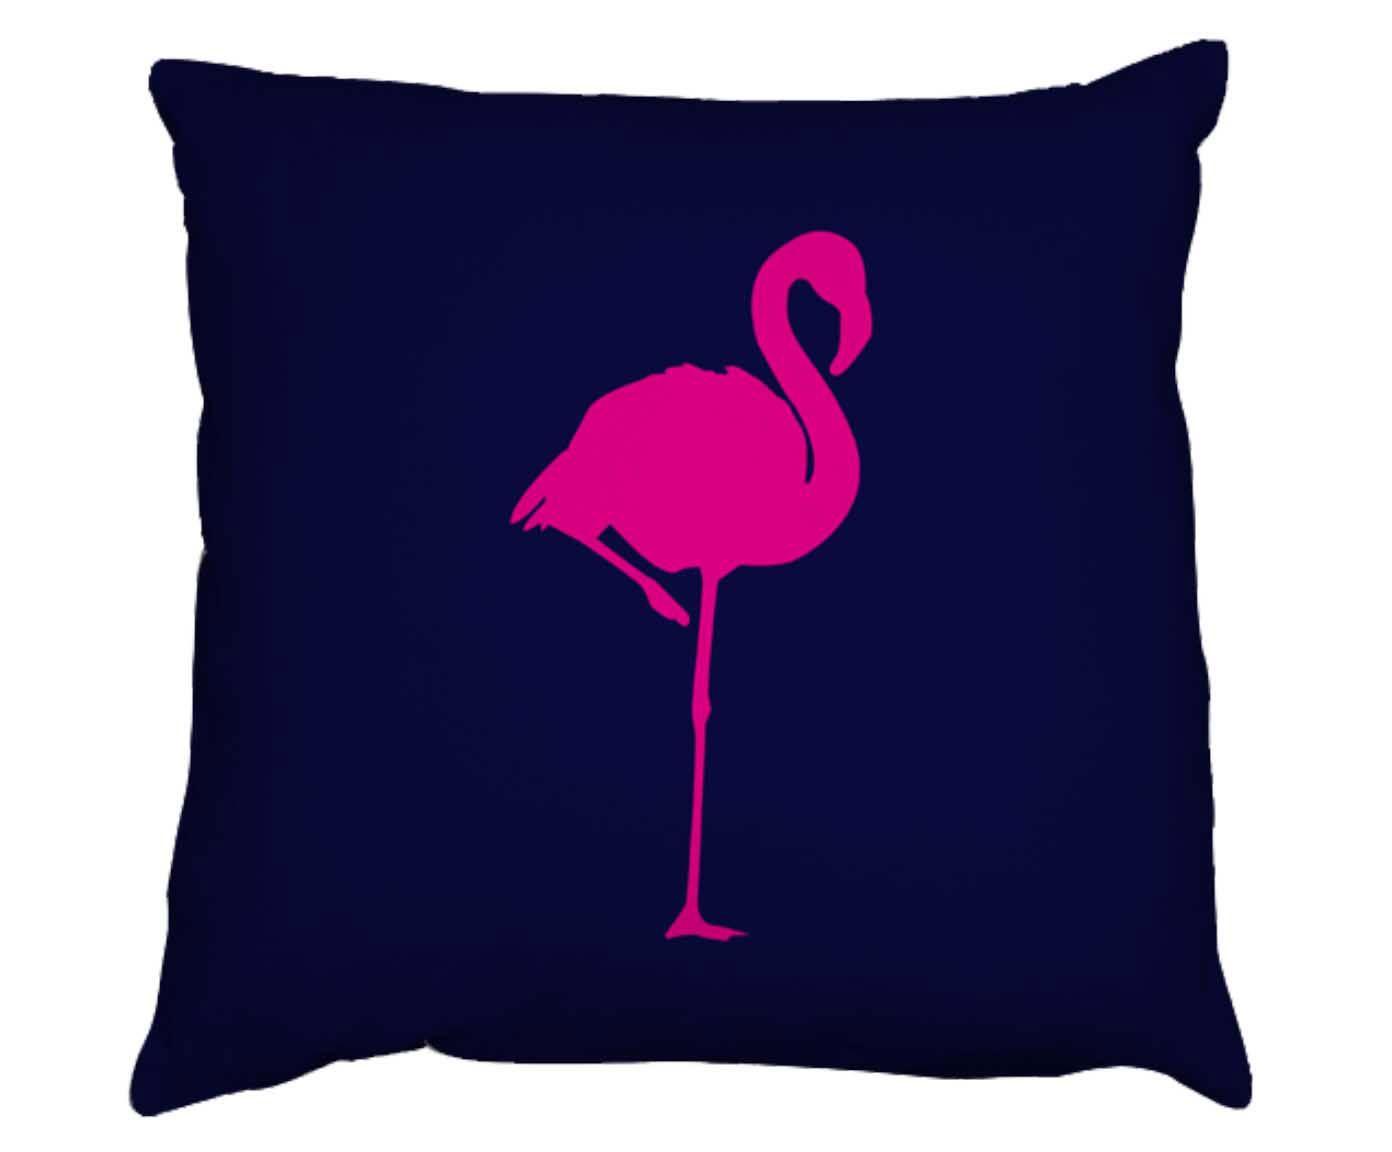 Capa para almofada flamingo maxi | Westwing.com.br